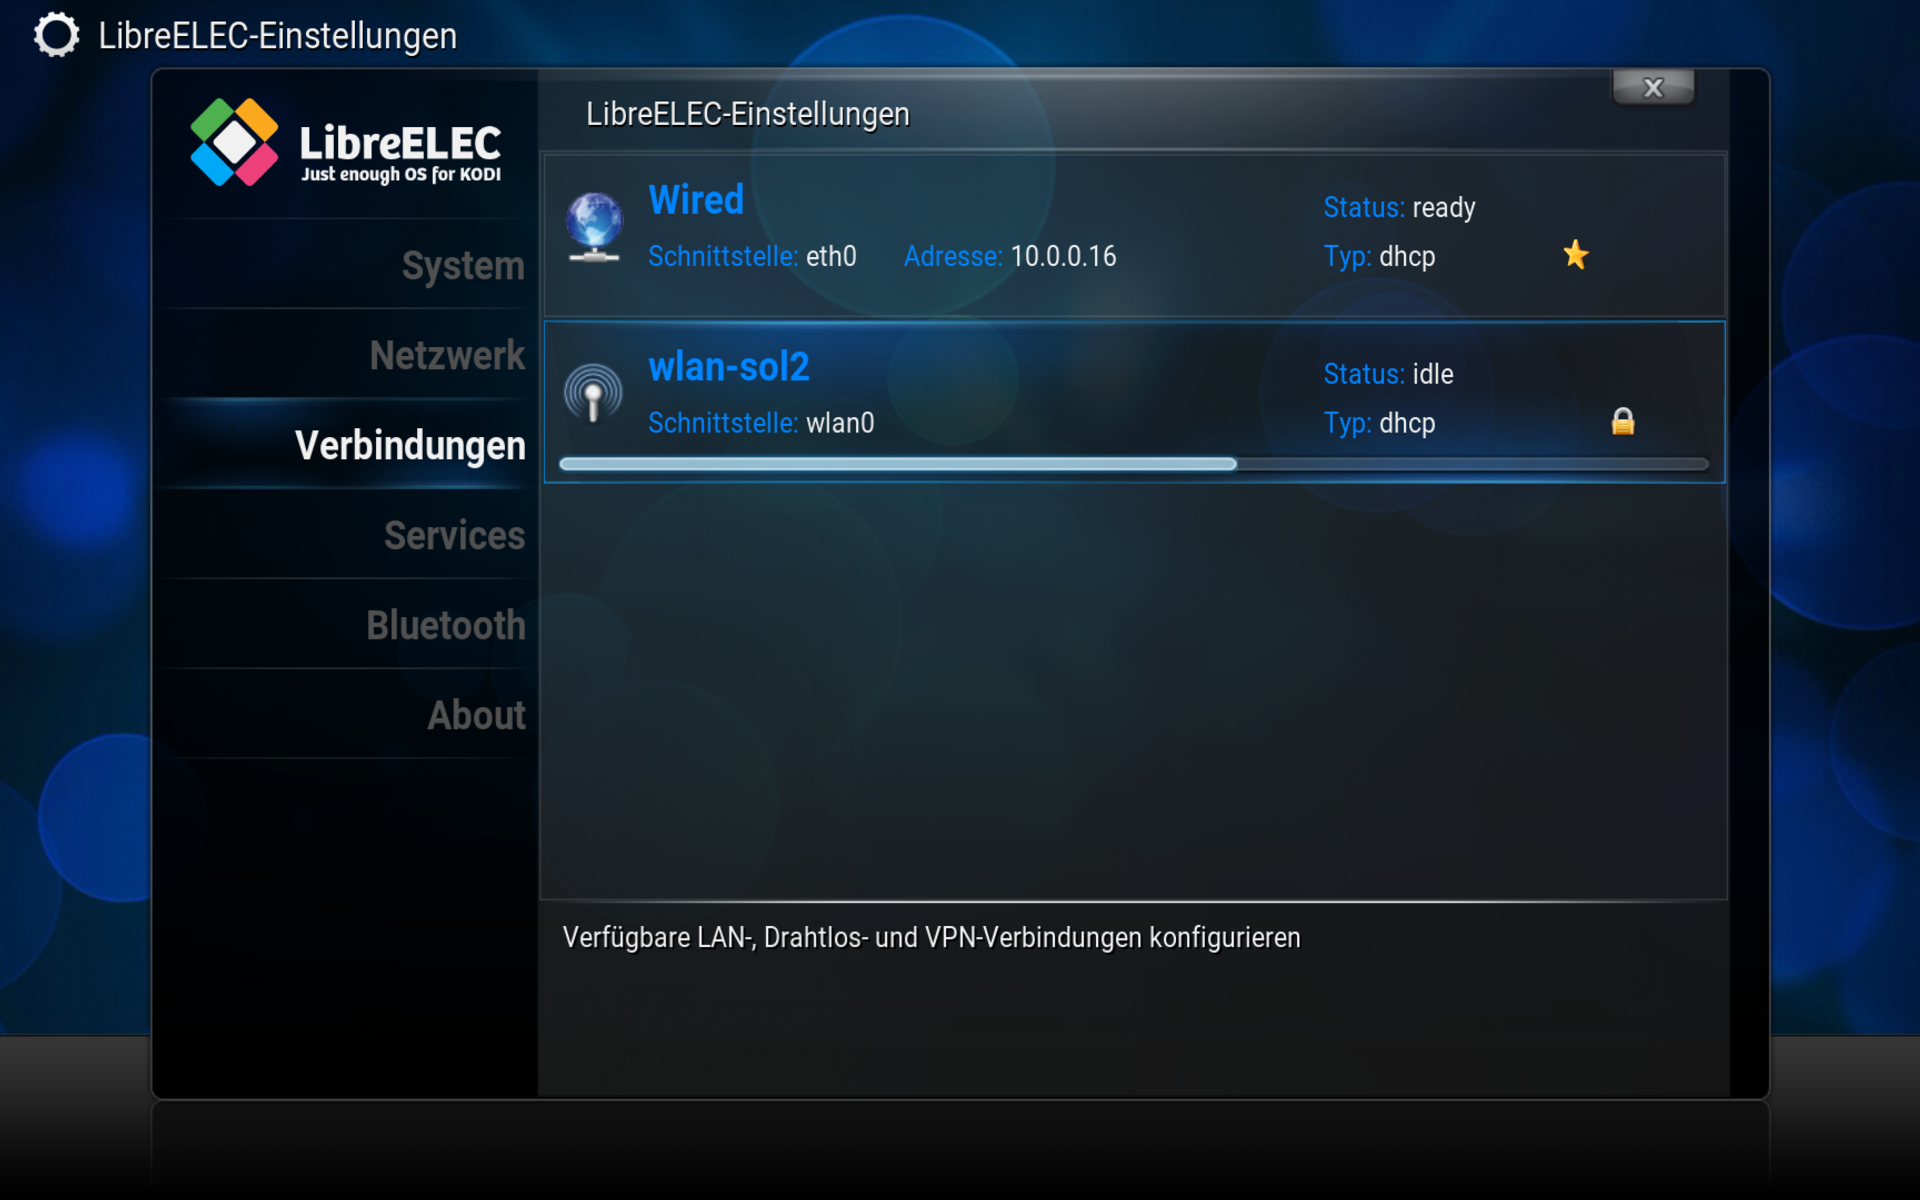 how to change openelec to libreelec